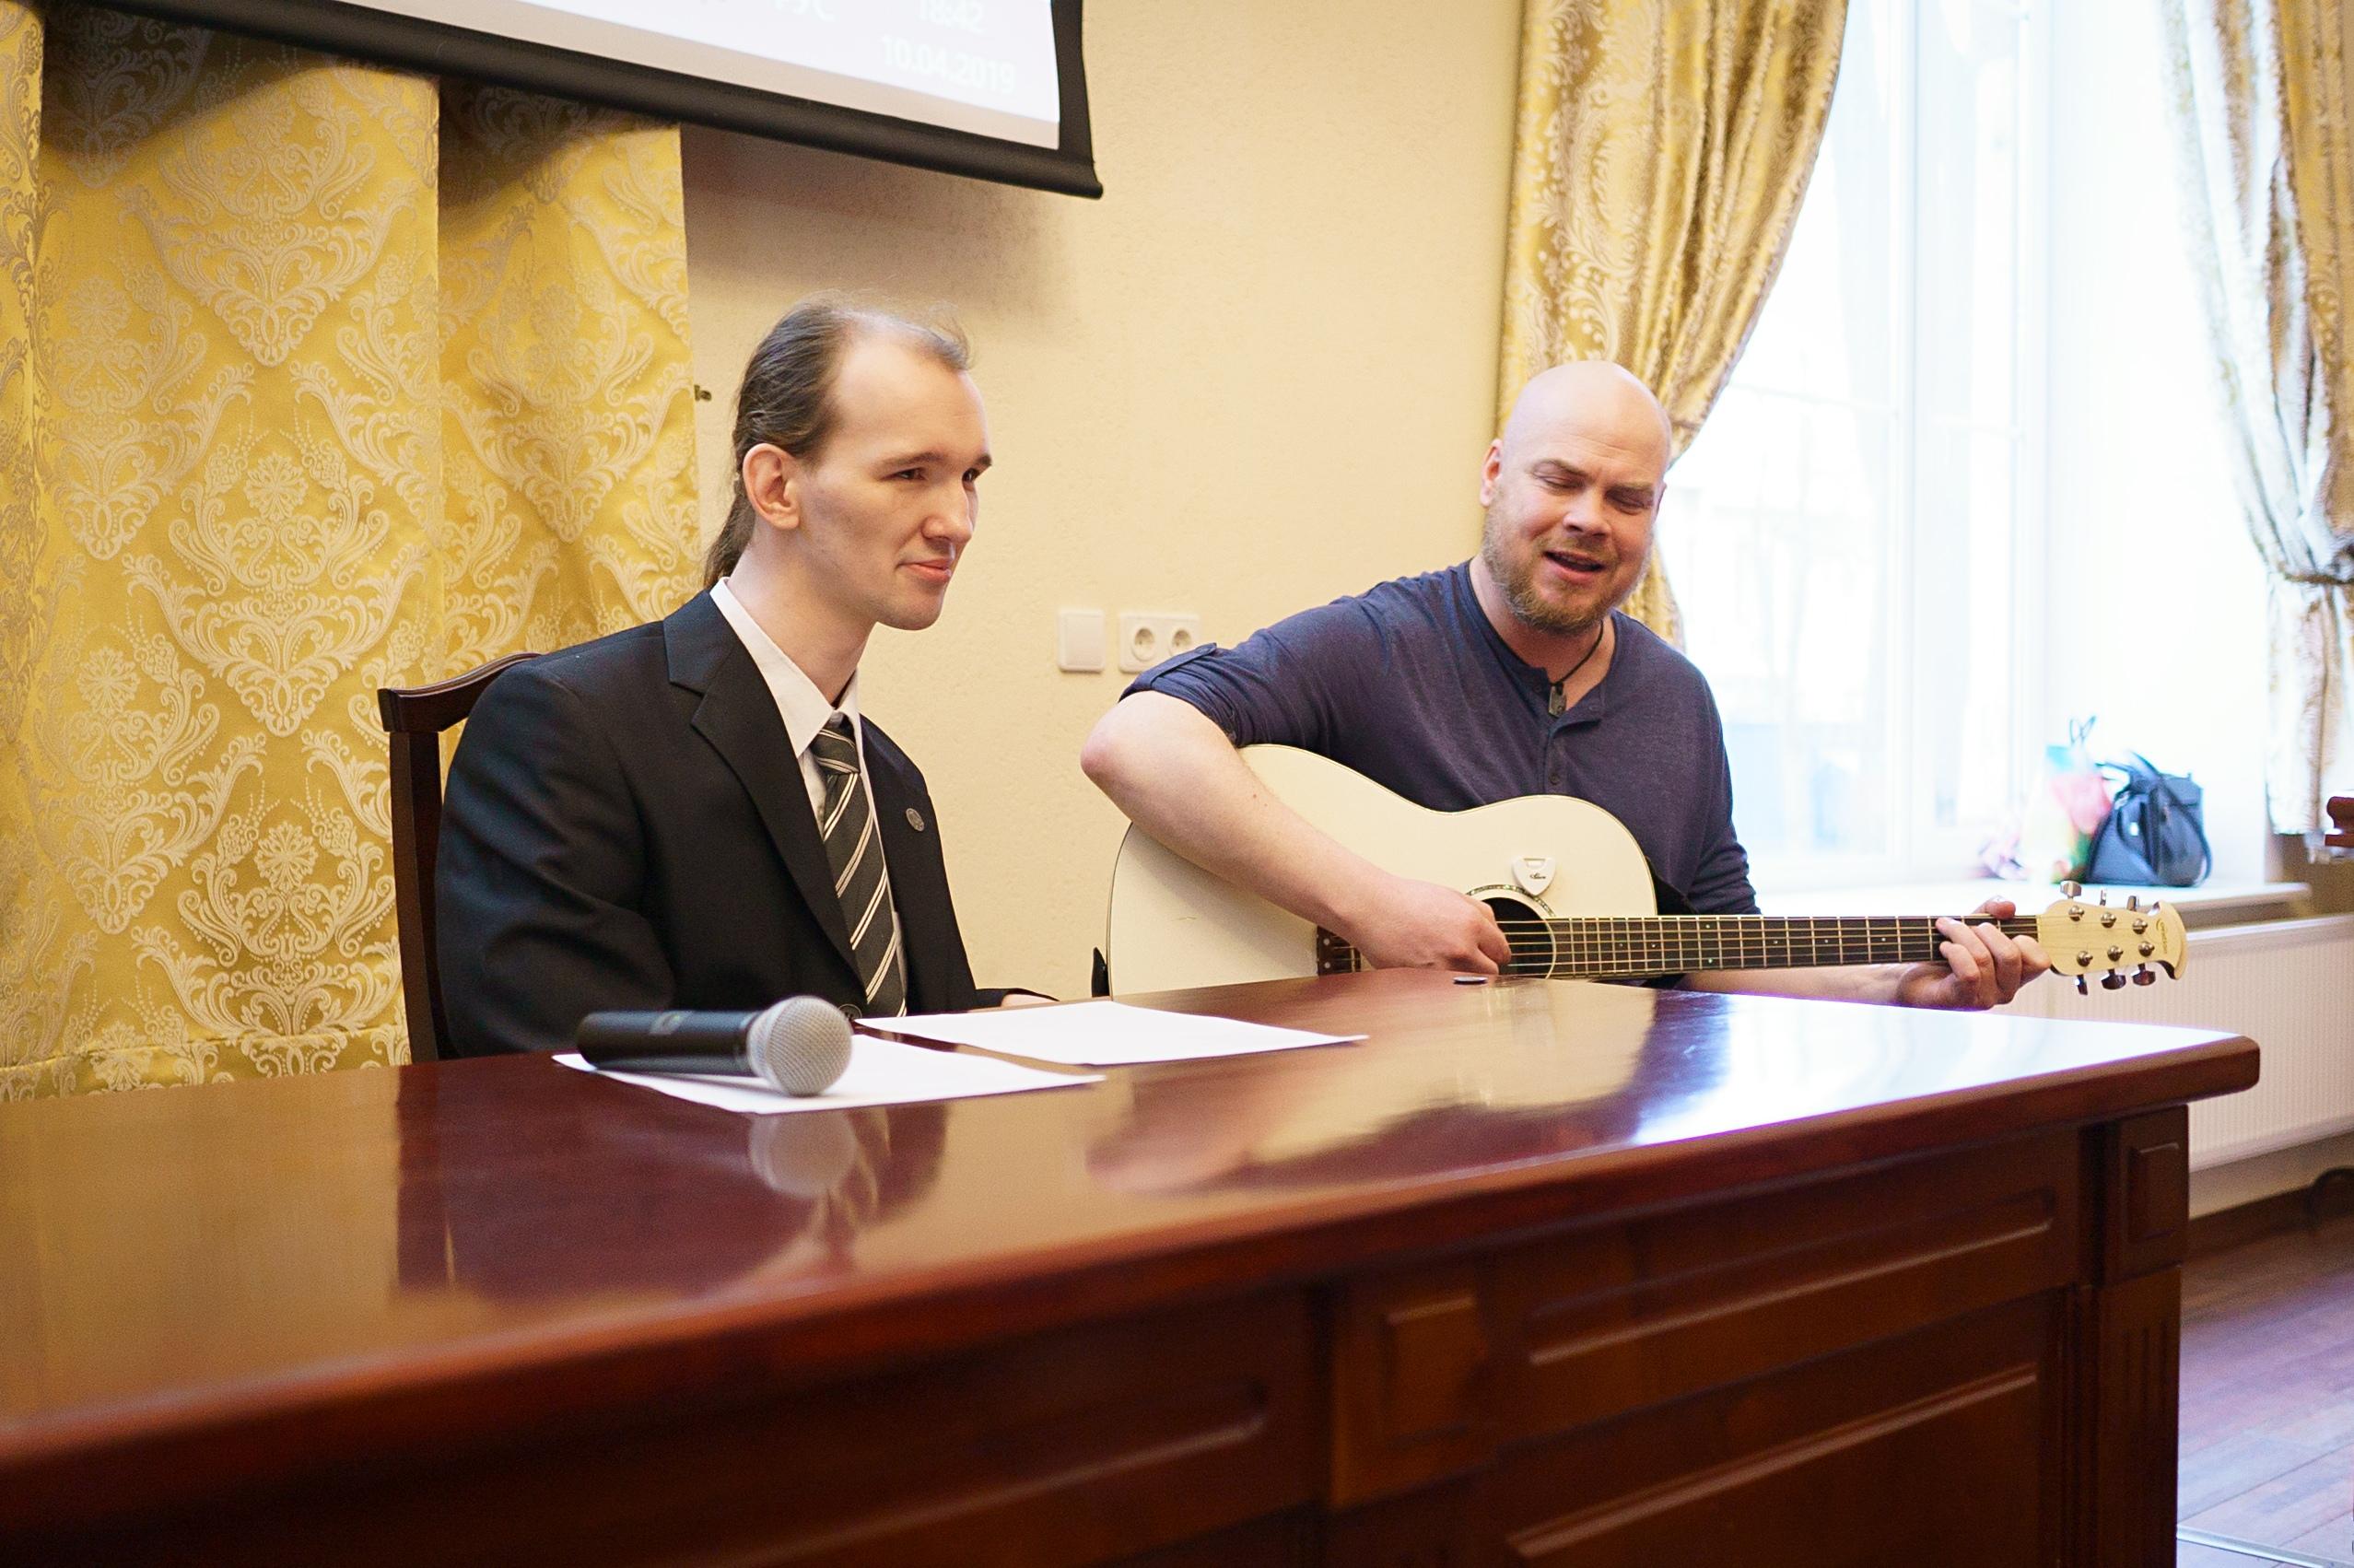 поэт Александр Меркушев и поэт-композитор Александр Яцуренко